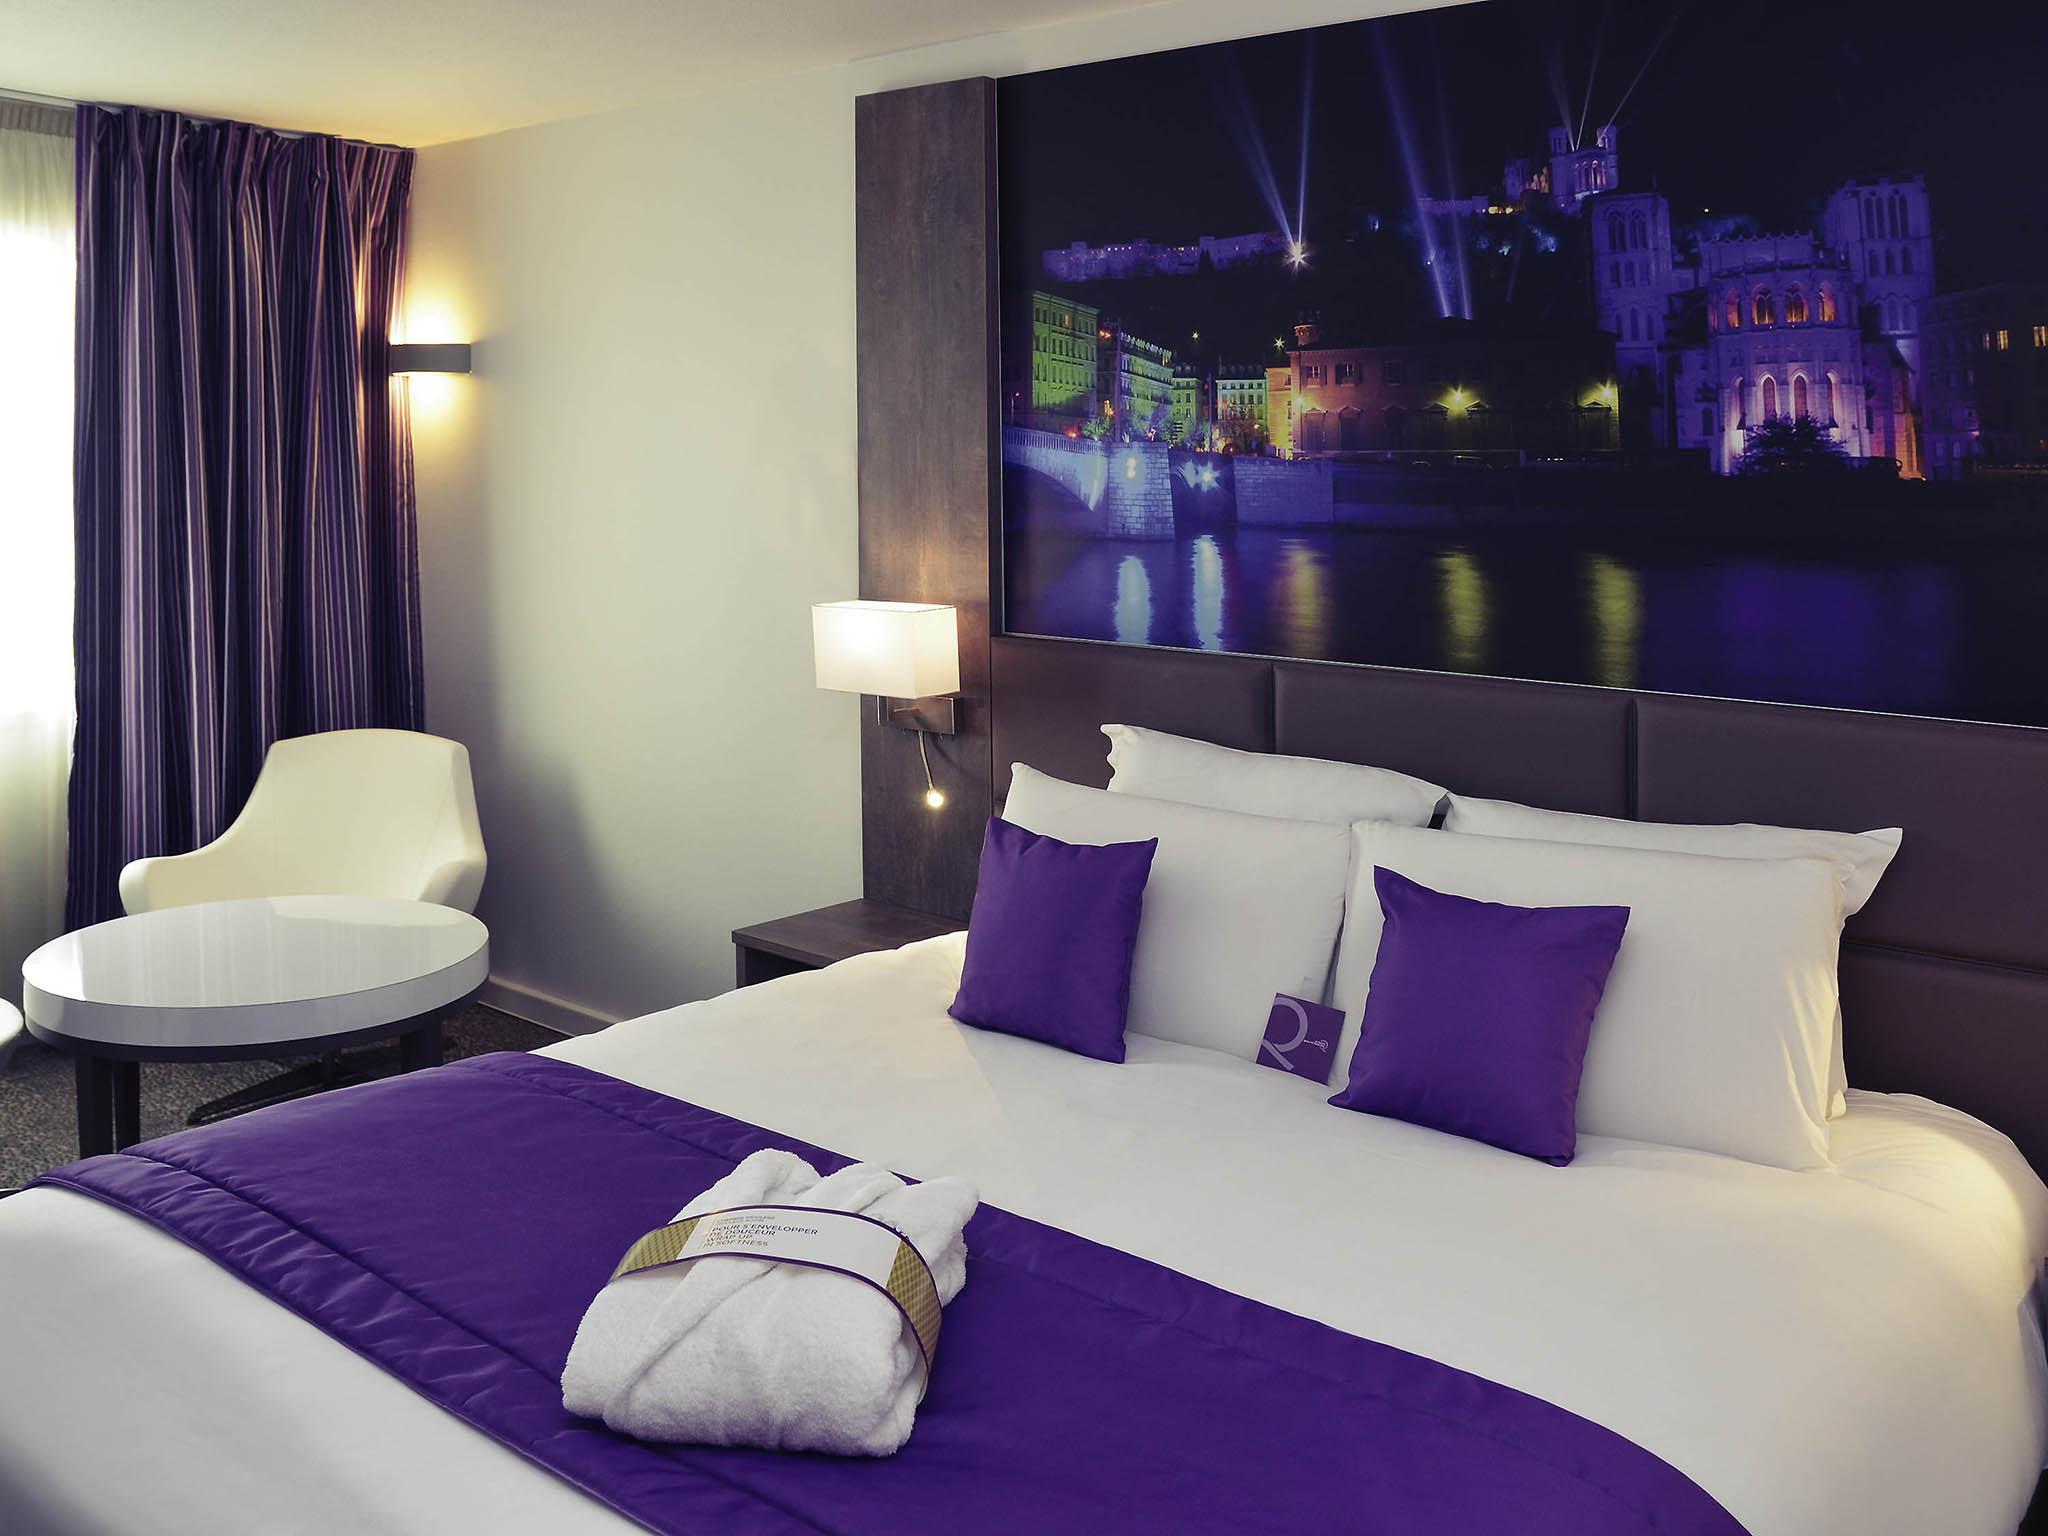 hotel mercure lyon est chaponnay hotel - Violet Hotel Design